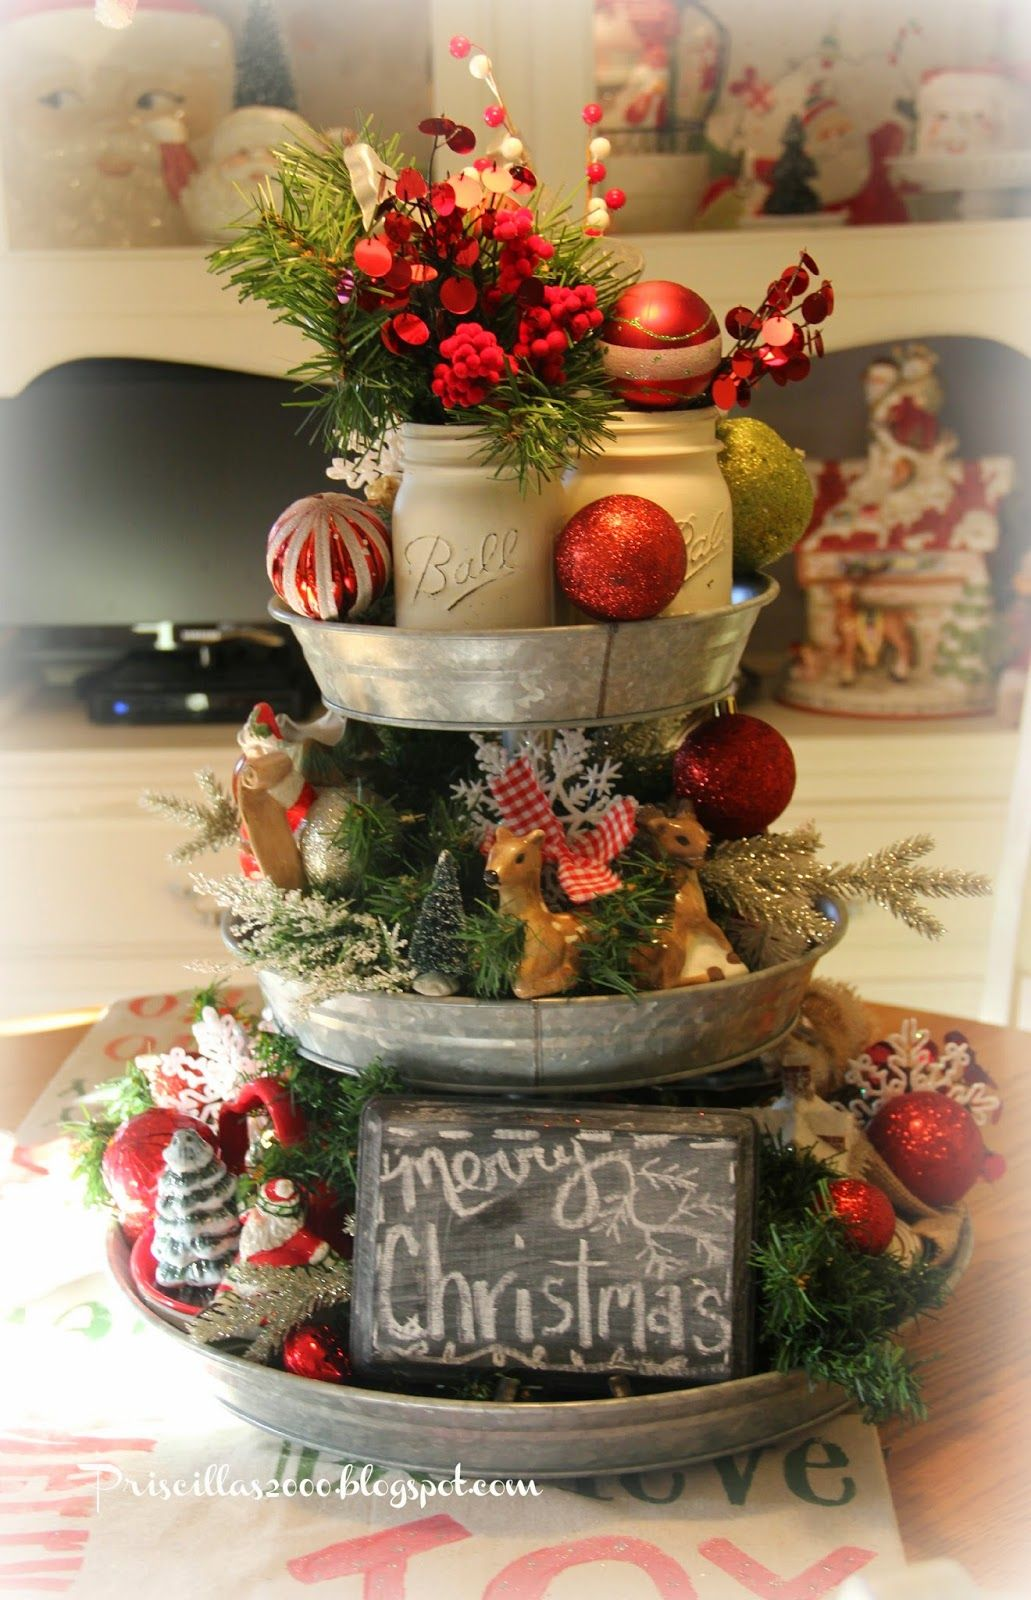 Christmas Galvanized Tray Centerpiece Christmas Decorations Christmas Centerpieces Country Christmas